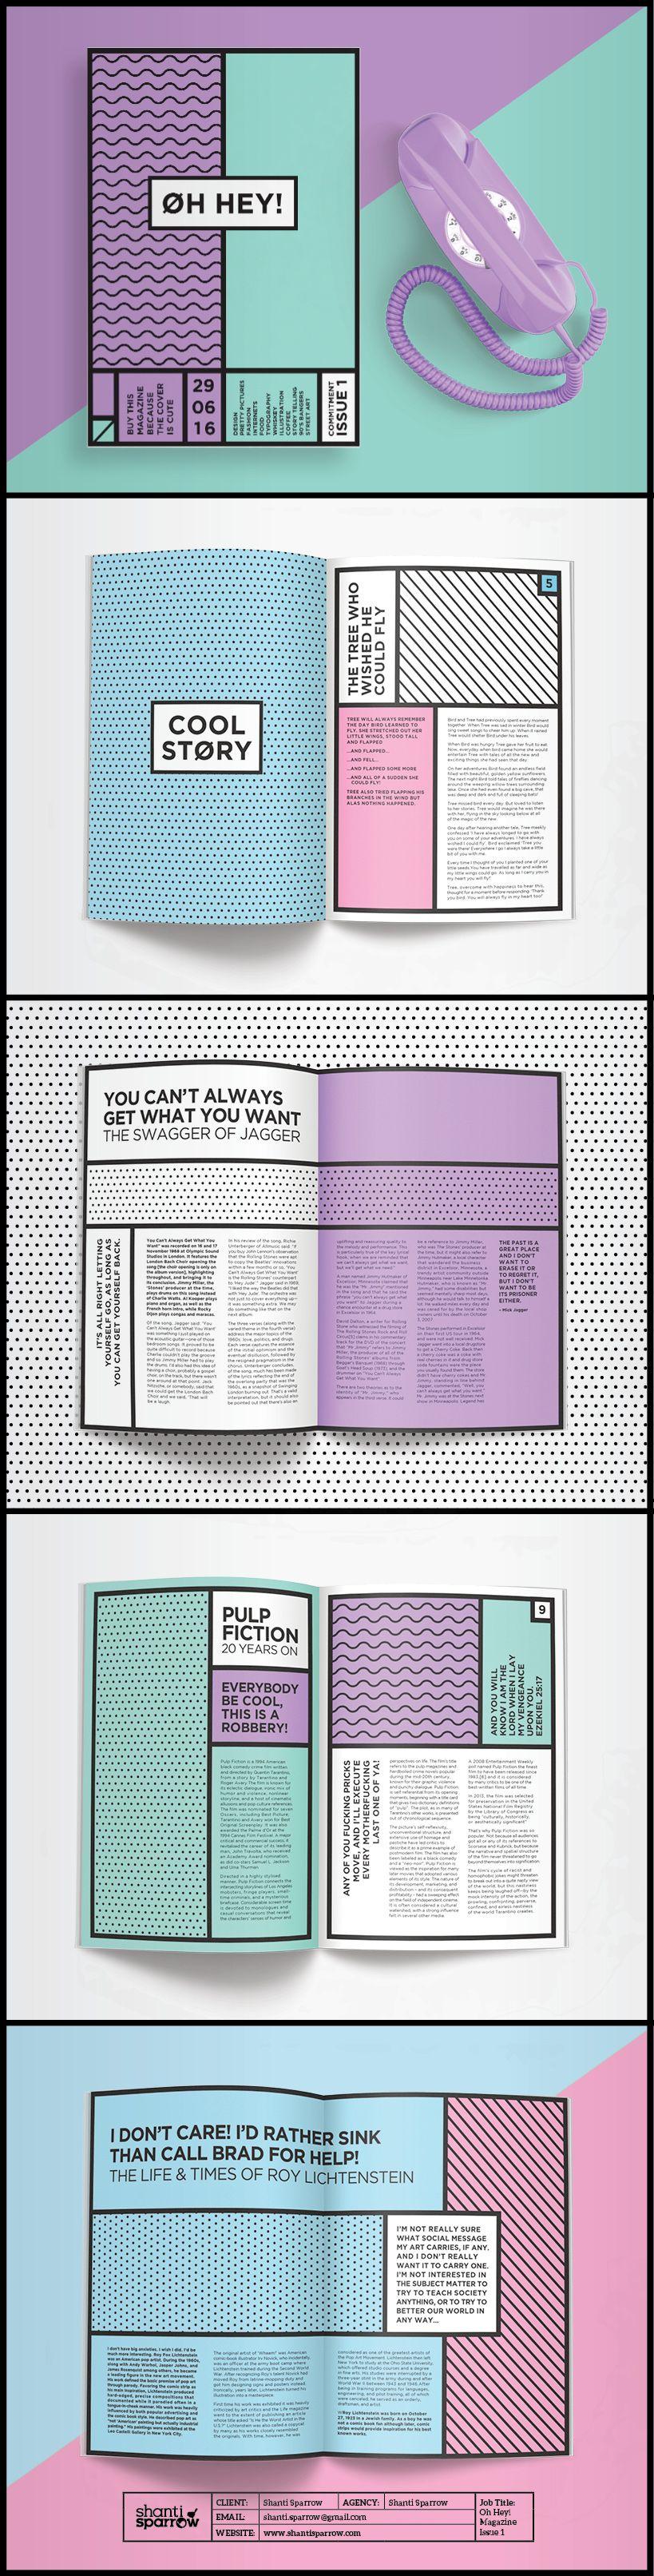 Cover Layout Design By Shanti Sparrow Wwwshantisparrowcom